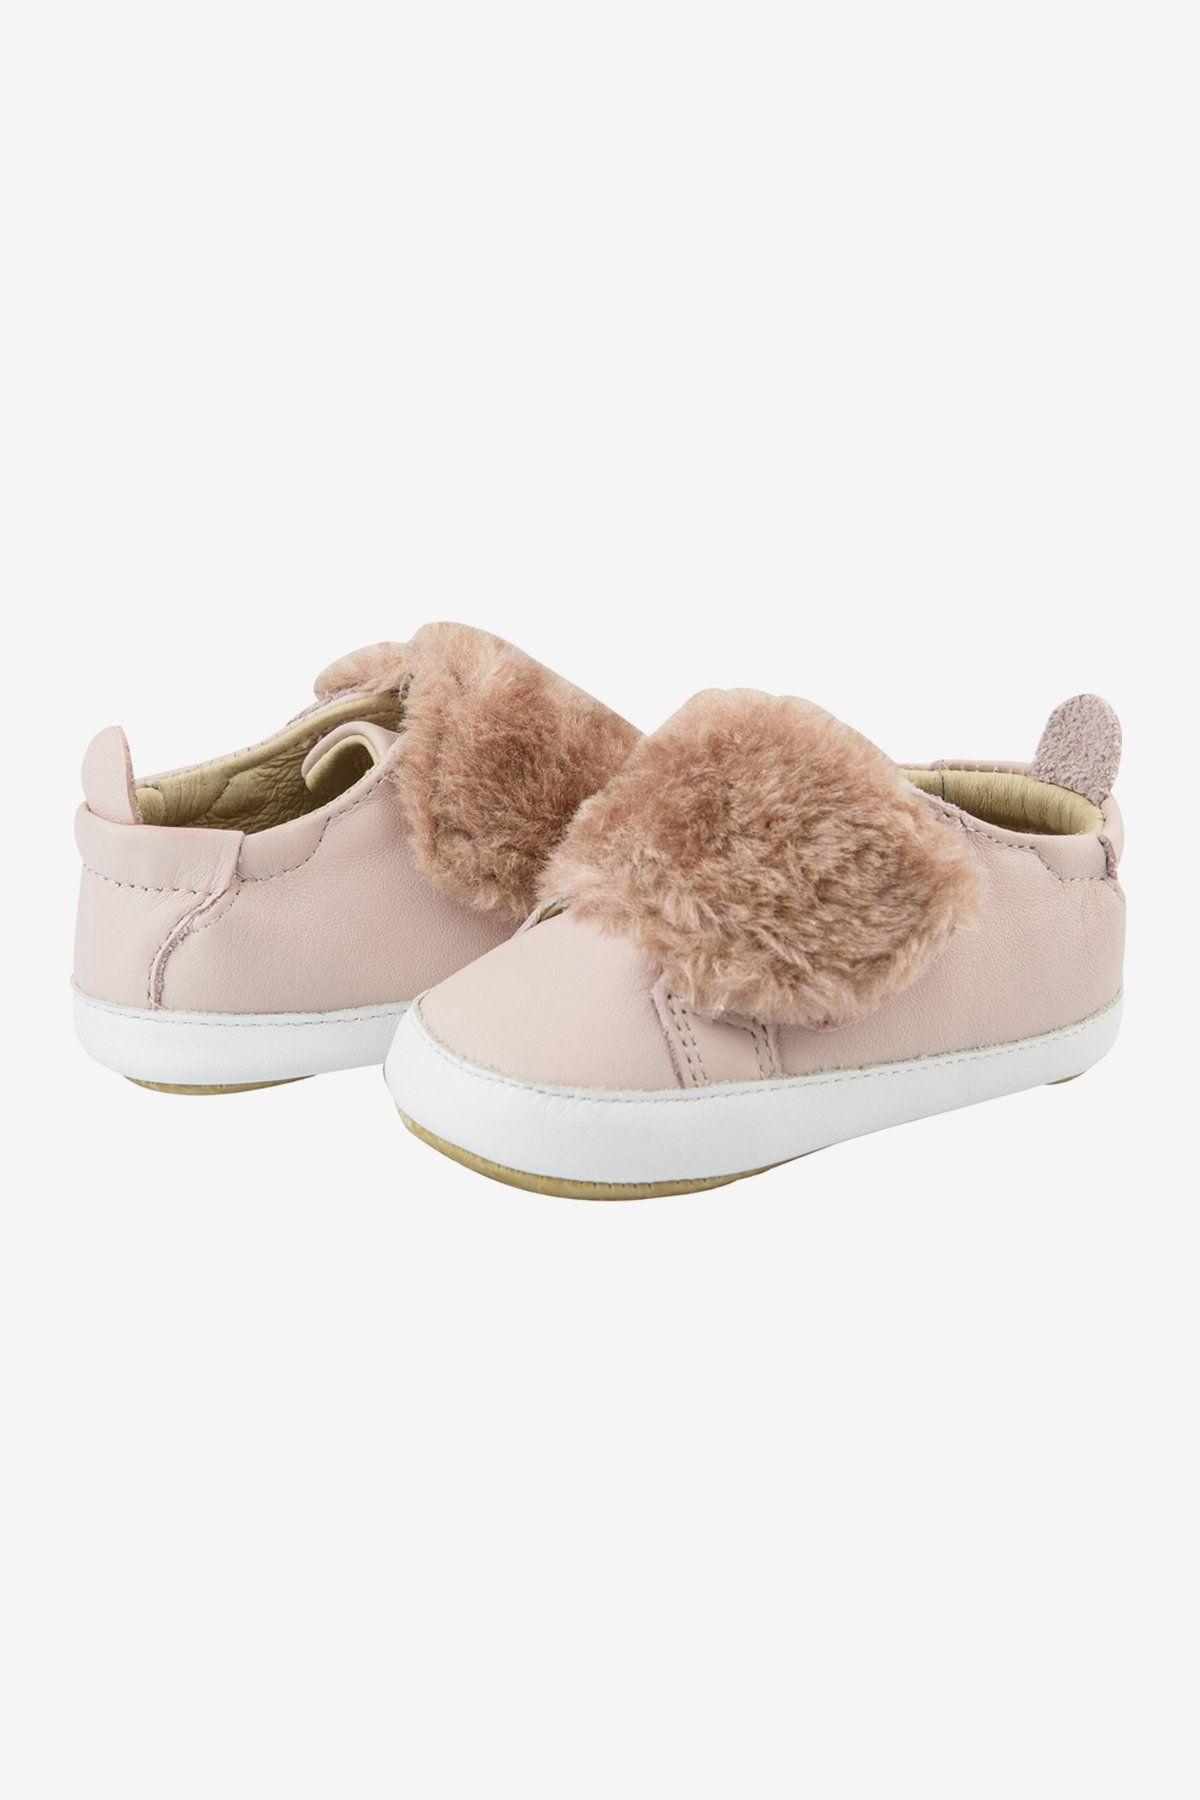 Old Soles Bambini Pet Walker Shoes Sole Shoes